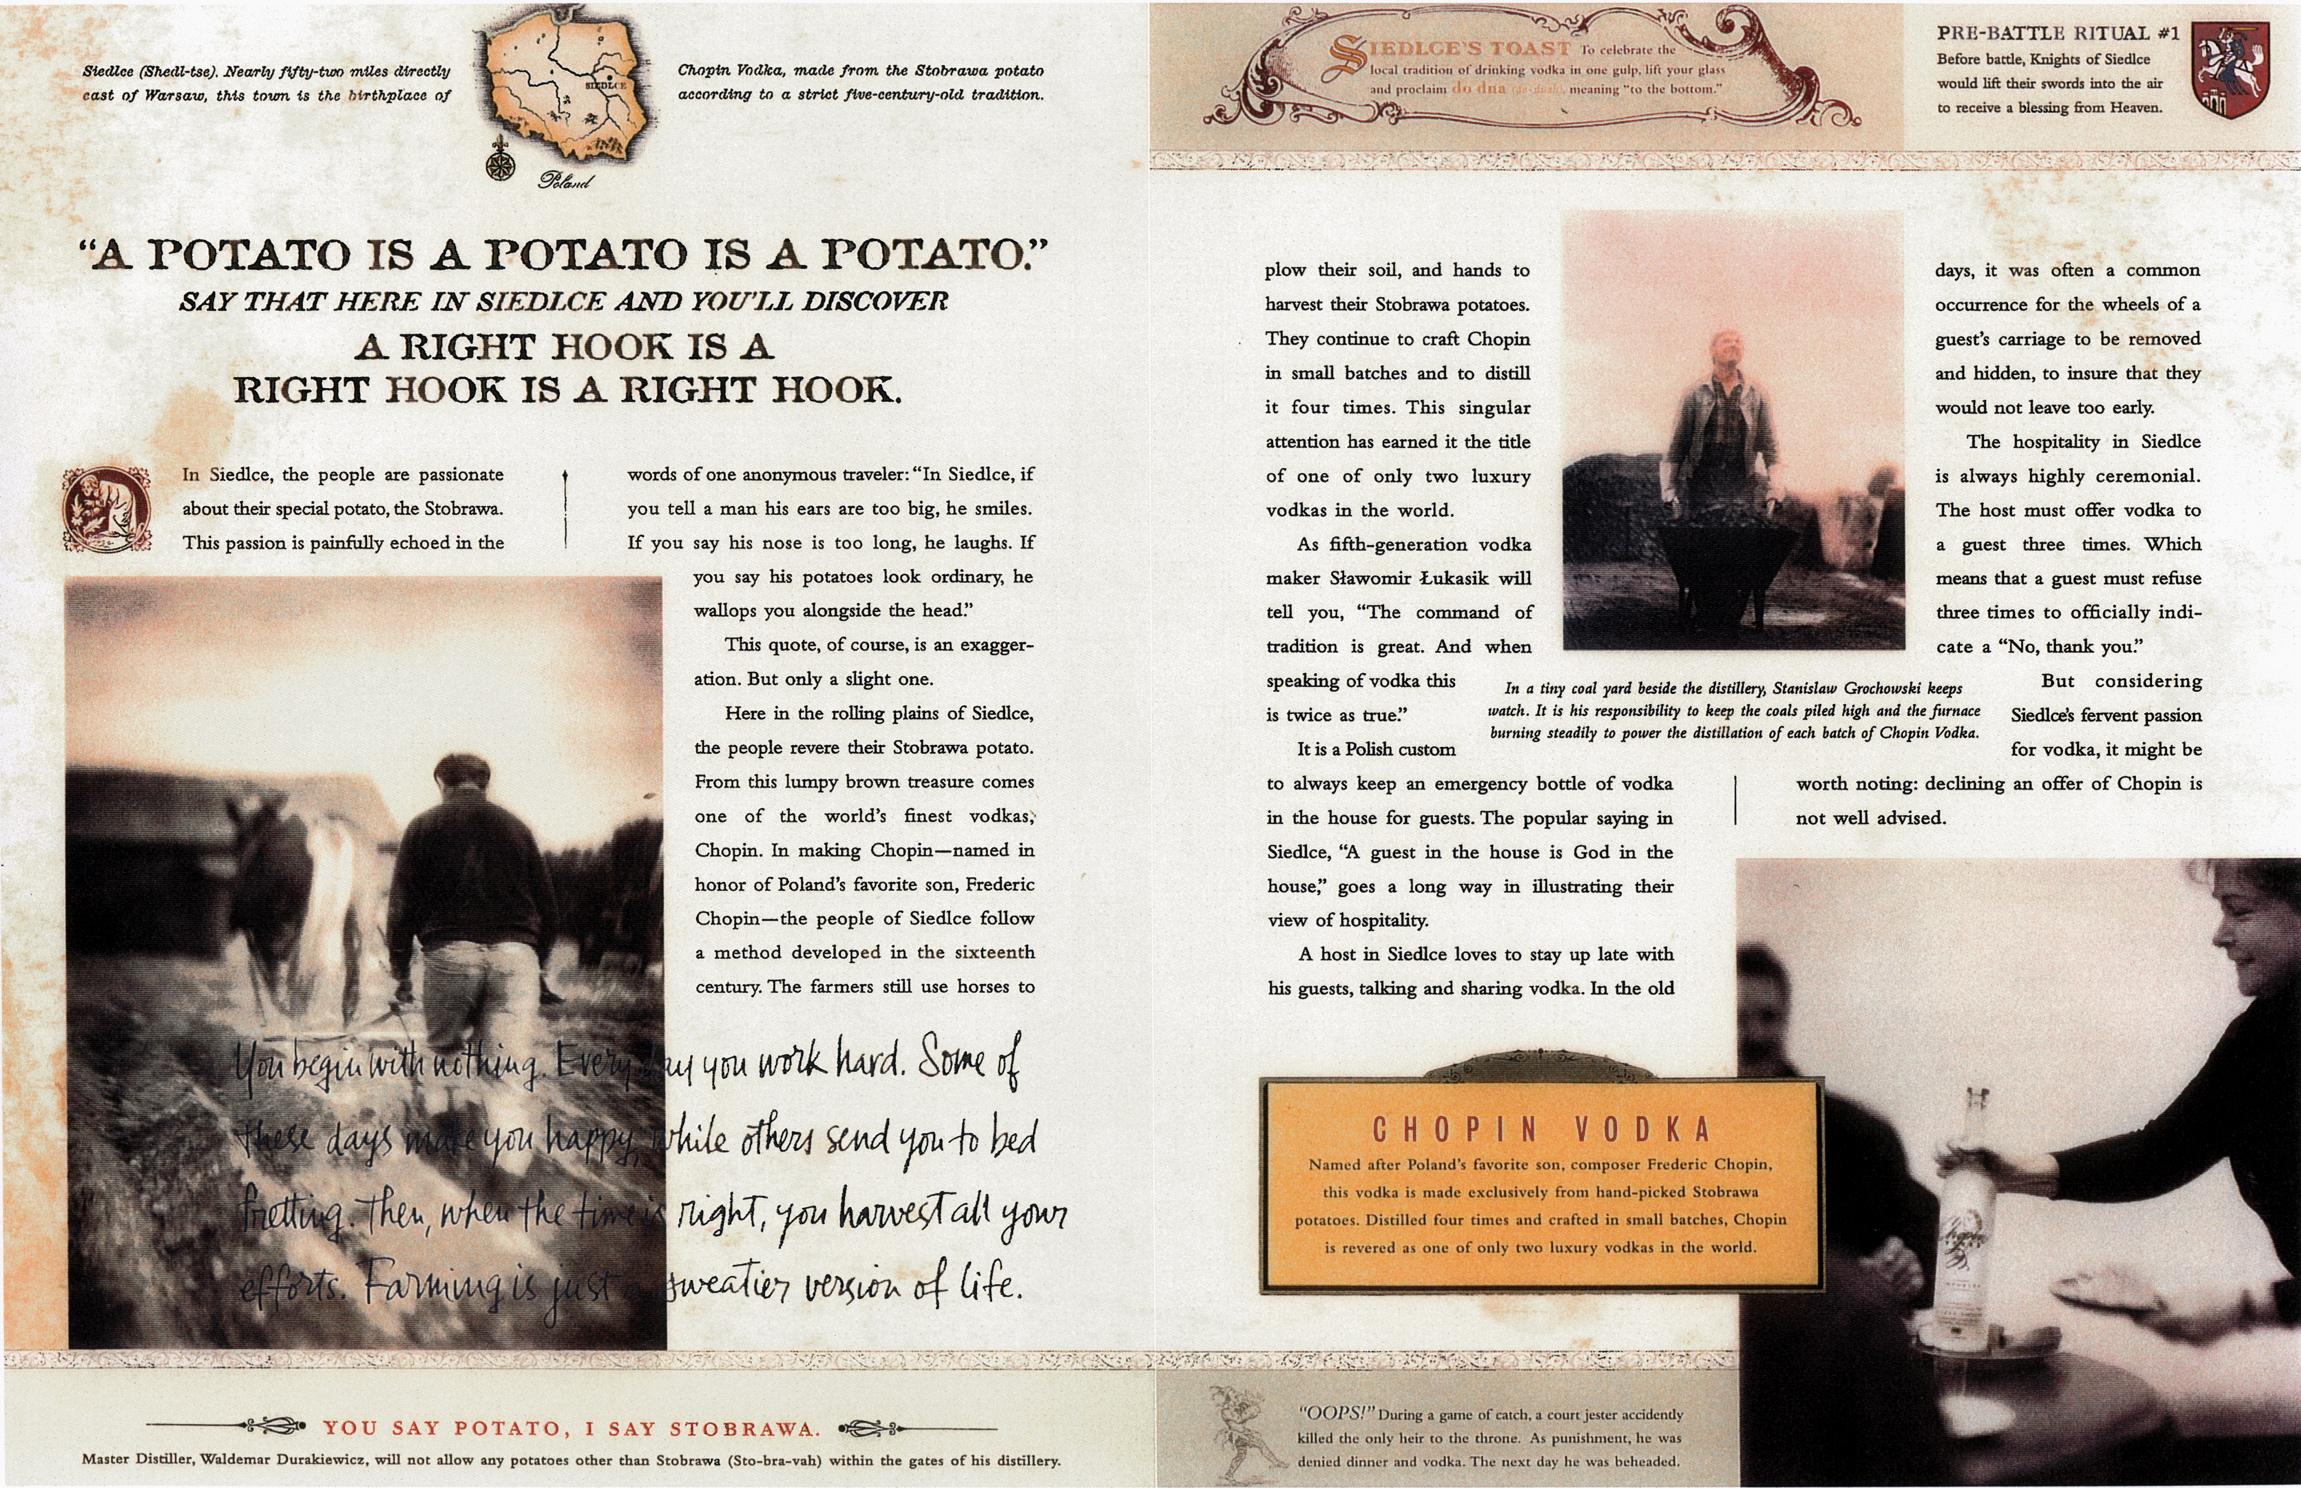 Print Campaign Belvedere & Chopin Vodka Michael Atkinson Creative